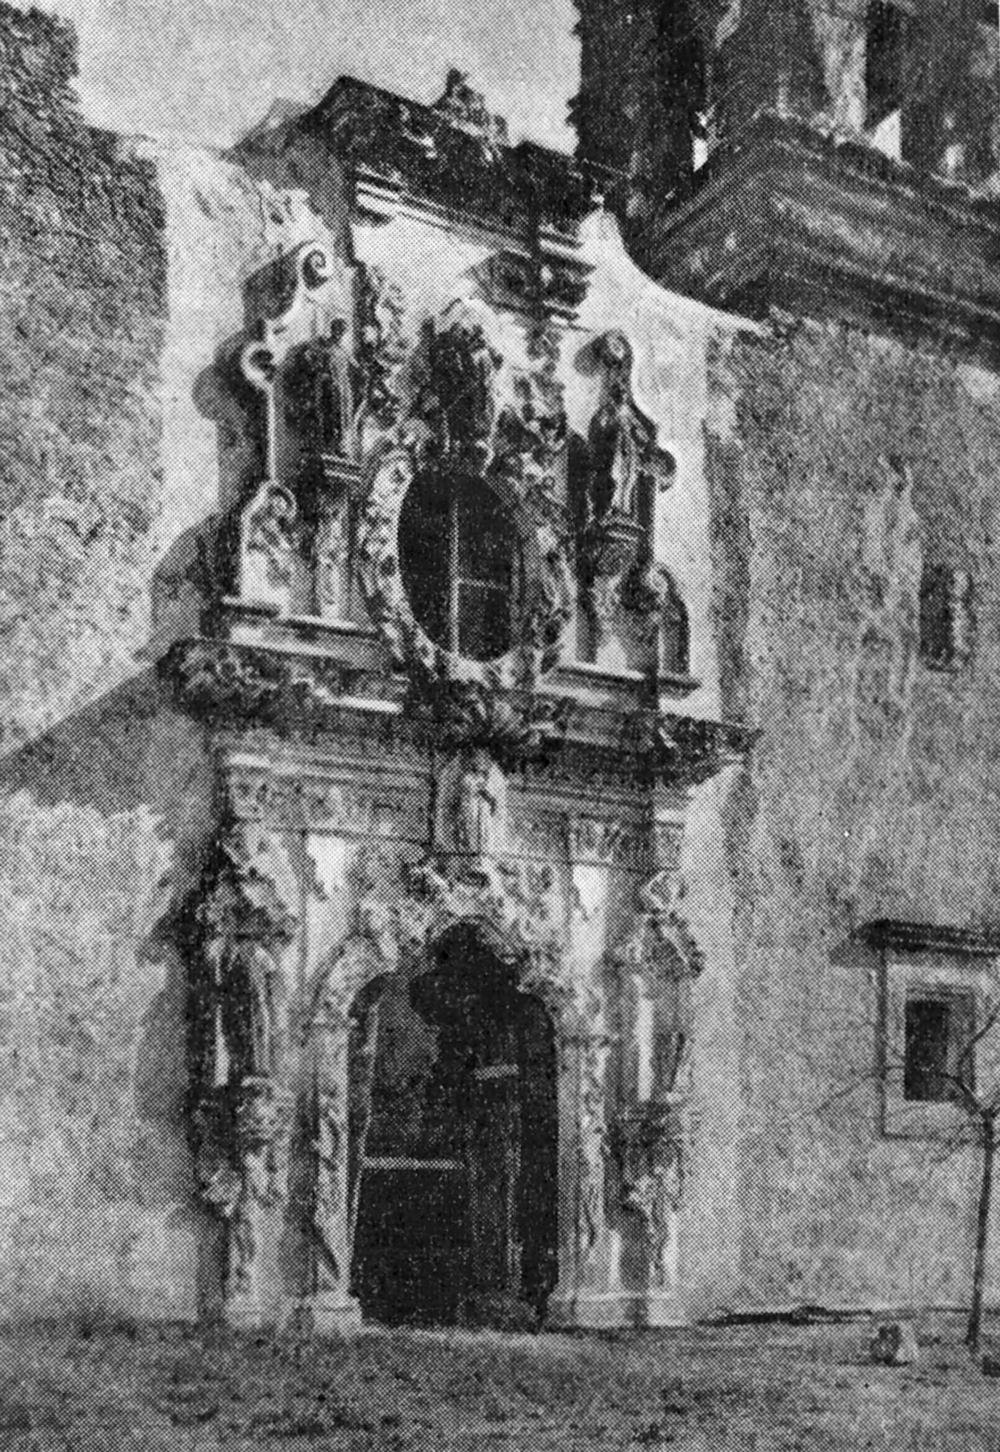 архитектура латинской америки Xvi начала Xix веков портал о